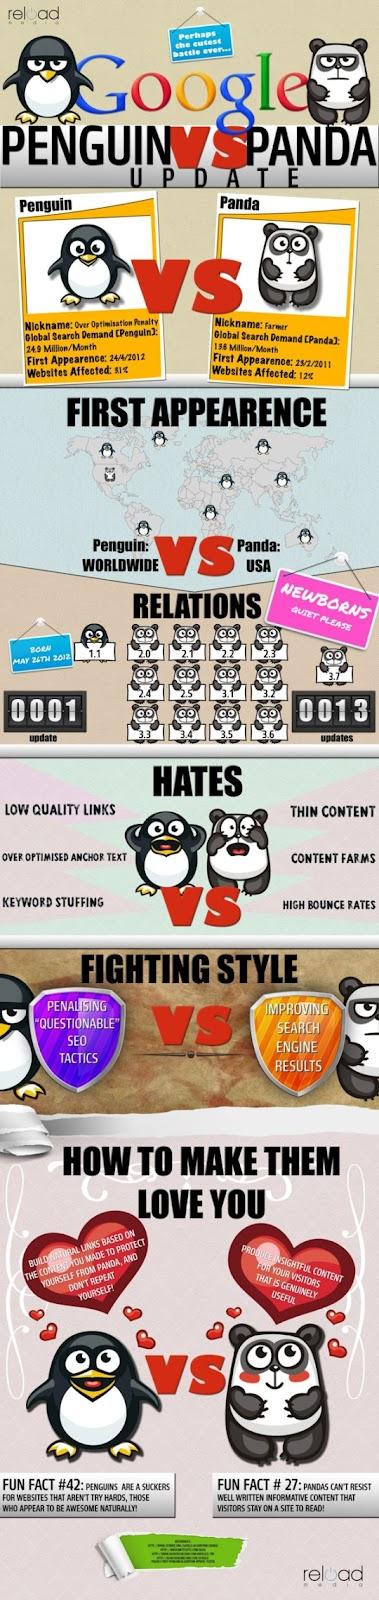 Infographic on Google Panda and Google Penguin